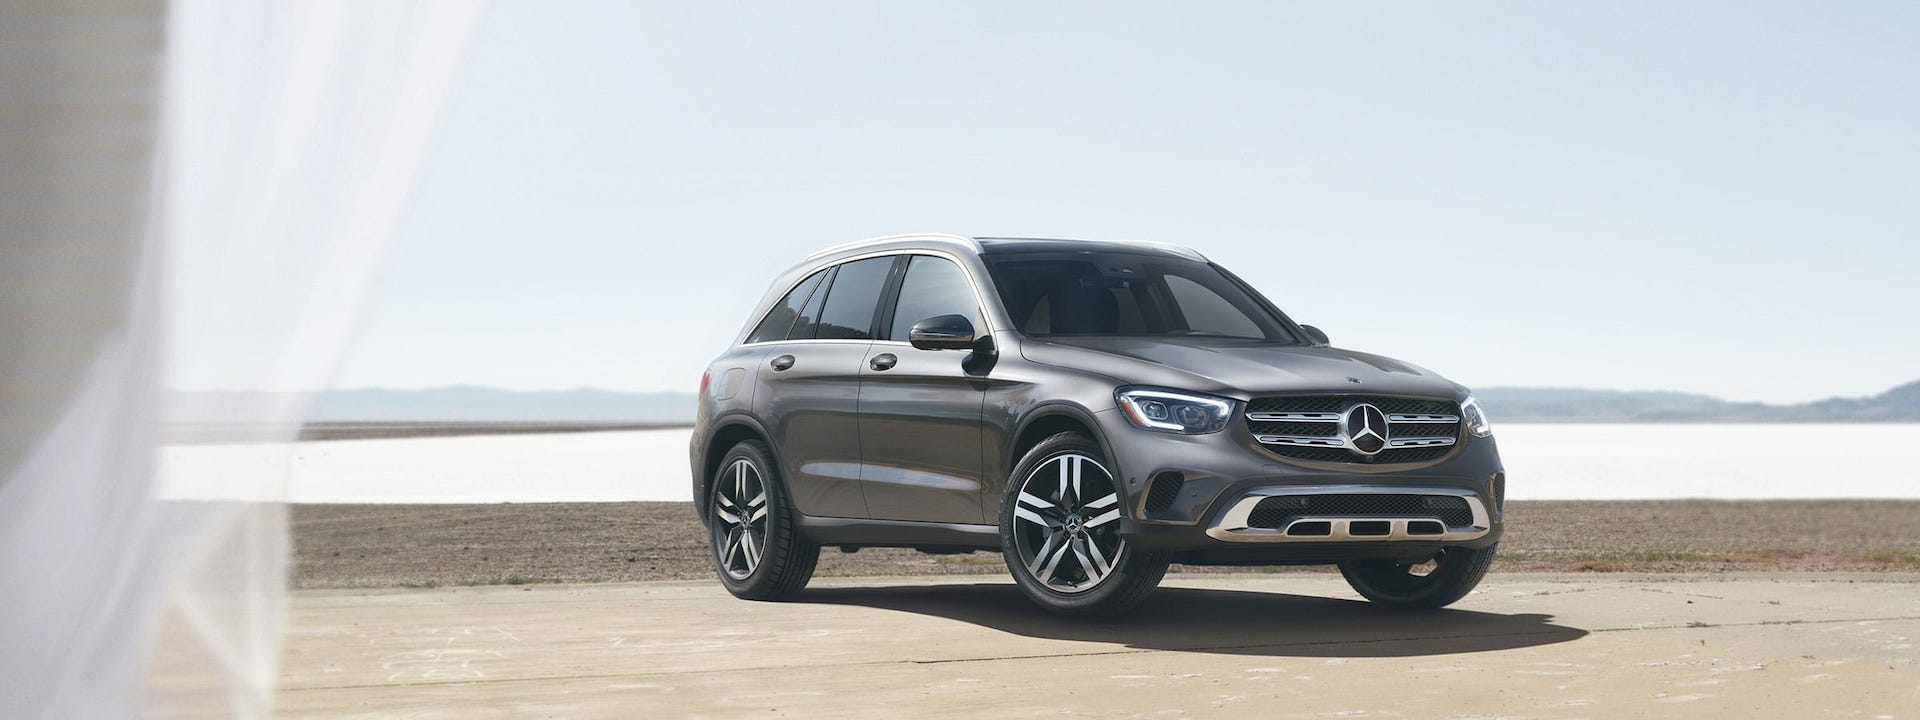 2020 Mercedes-Benz GLC SUV | ZT Motors of Fort Walton Beach